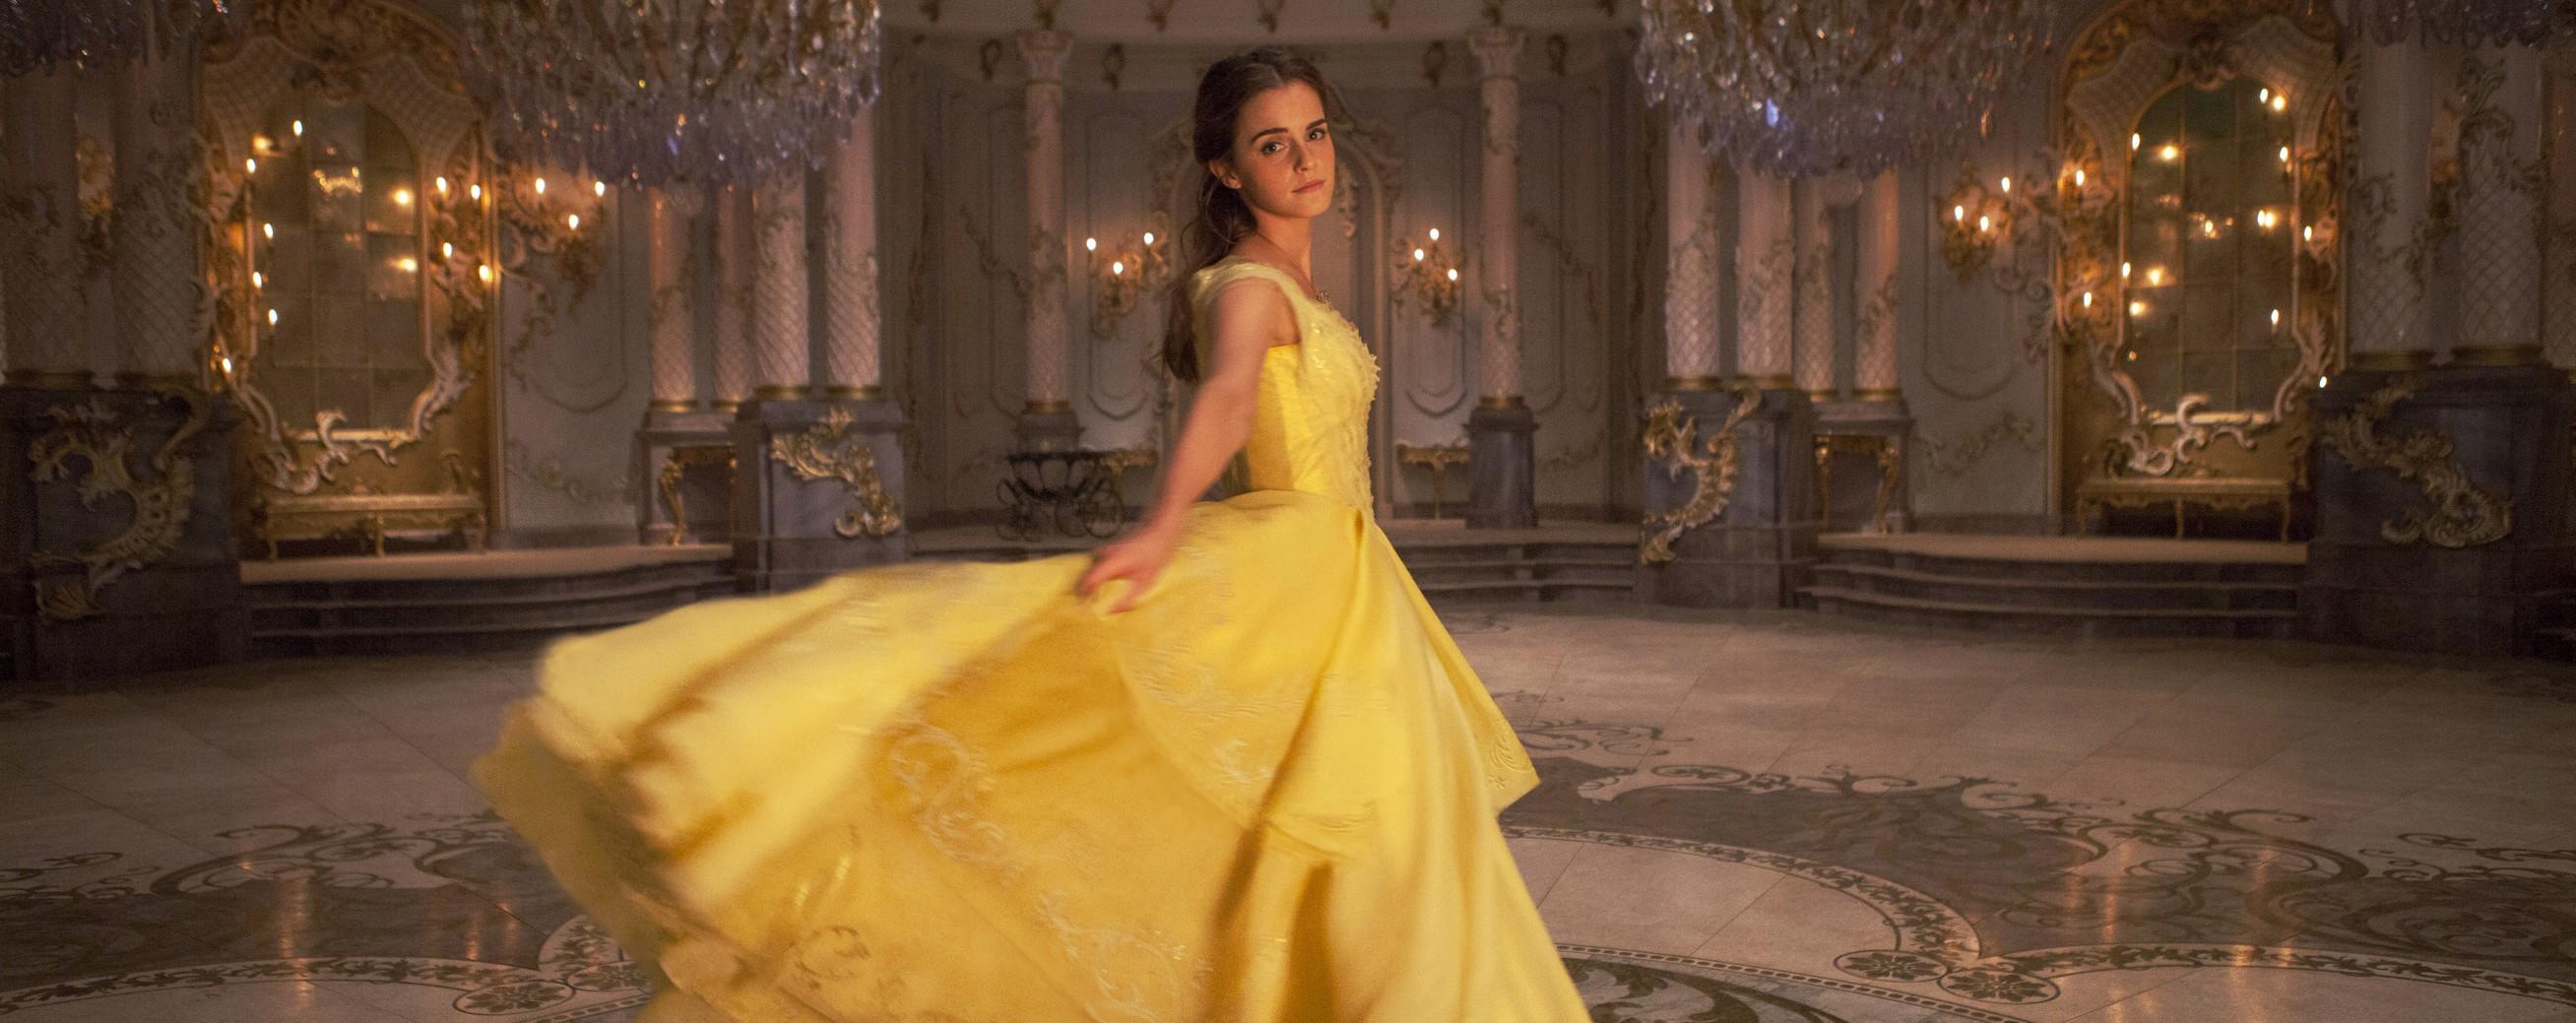 Robe jaune belle et la bete